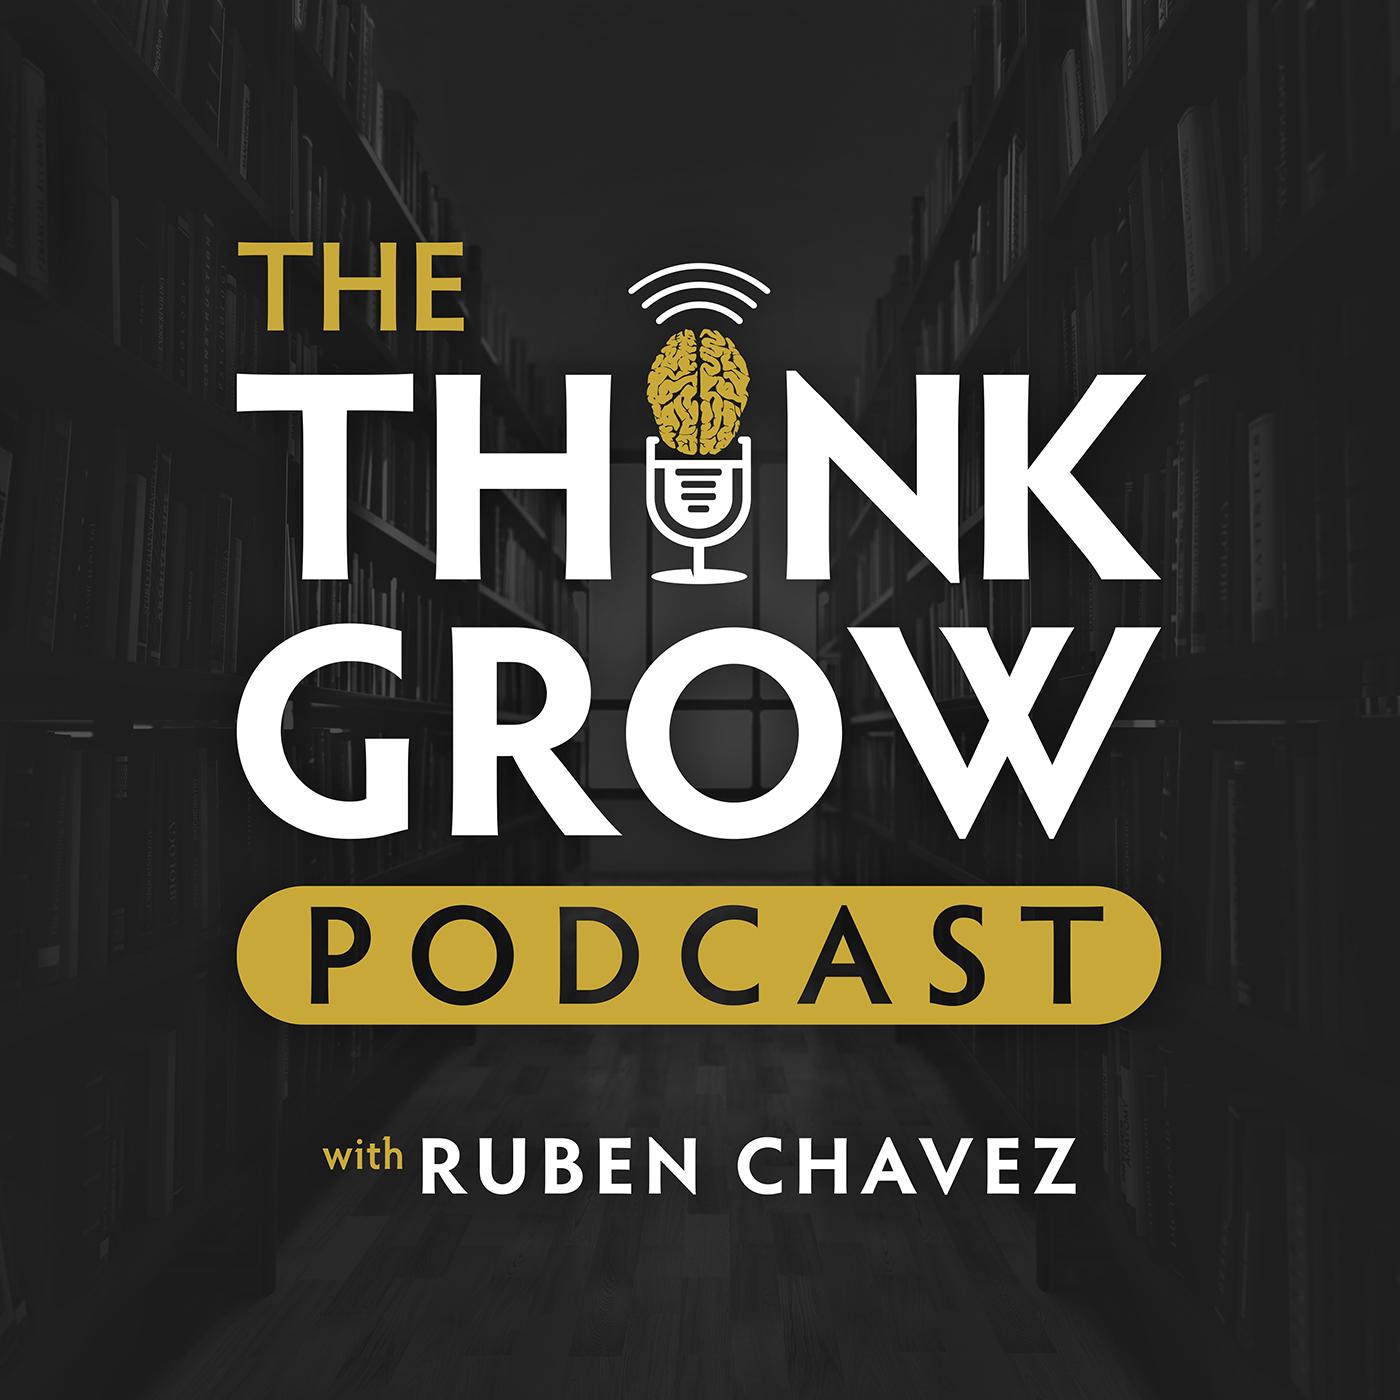 Think Grow Podcast Cover Art (1400x1400).jpg